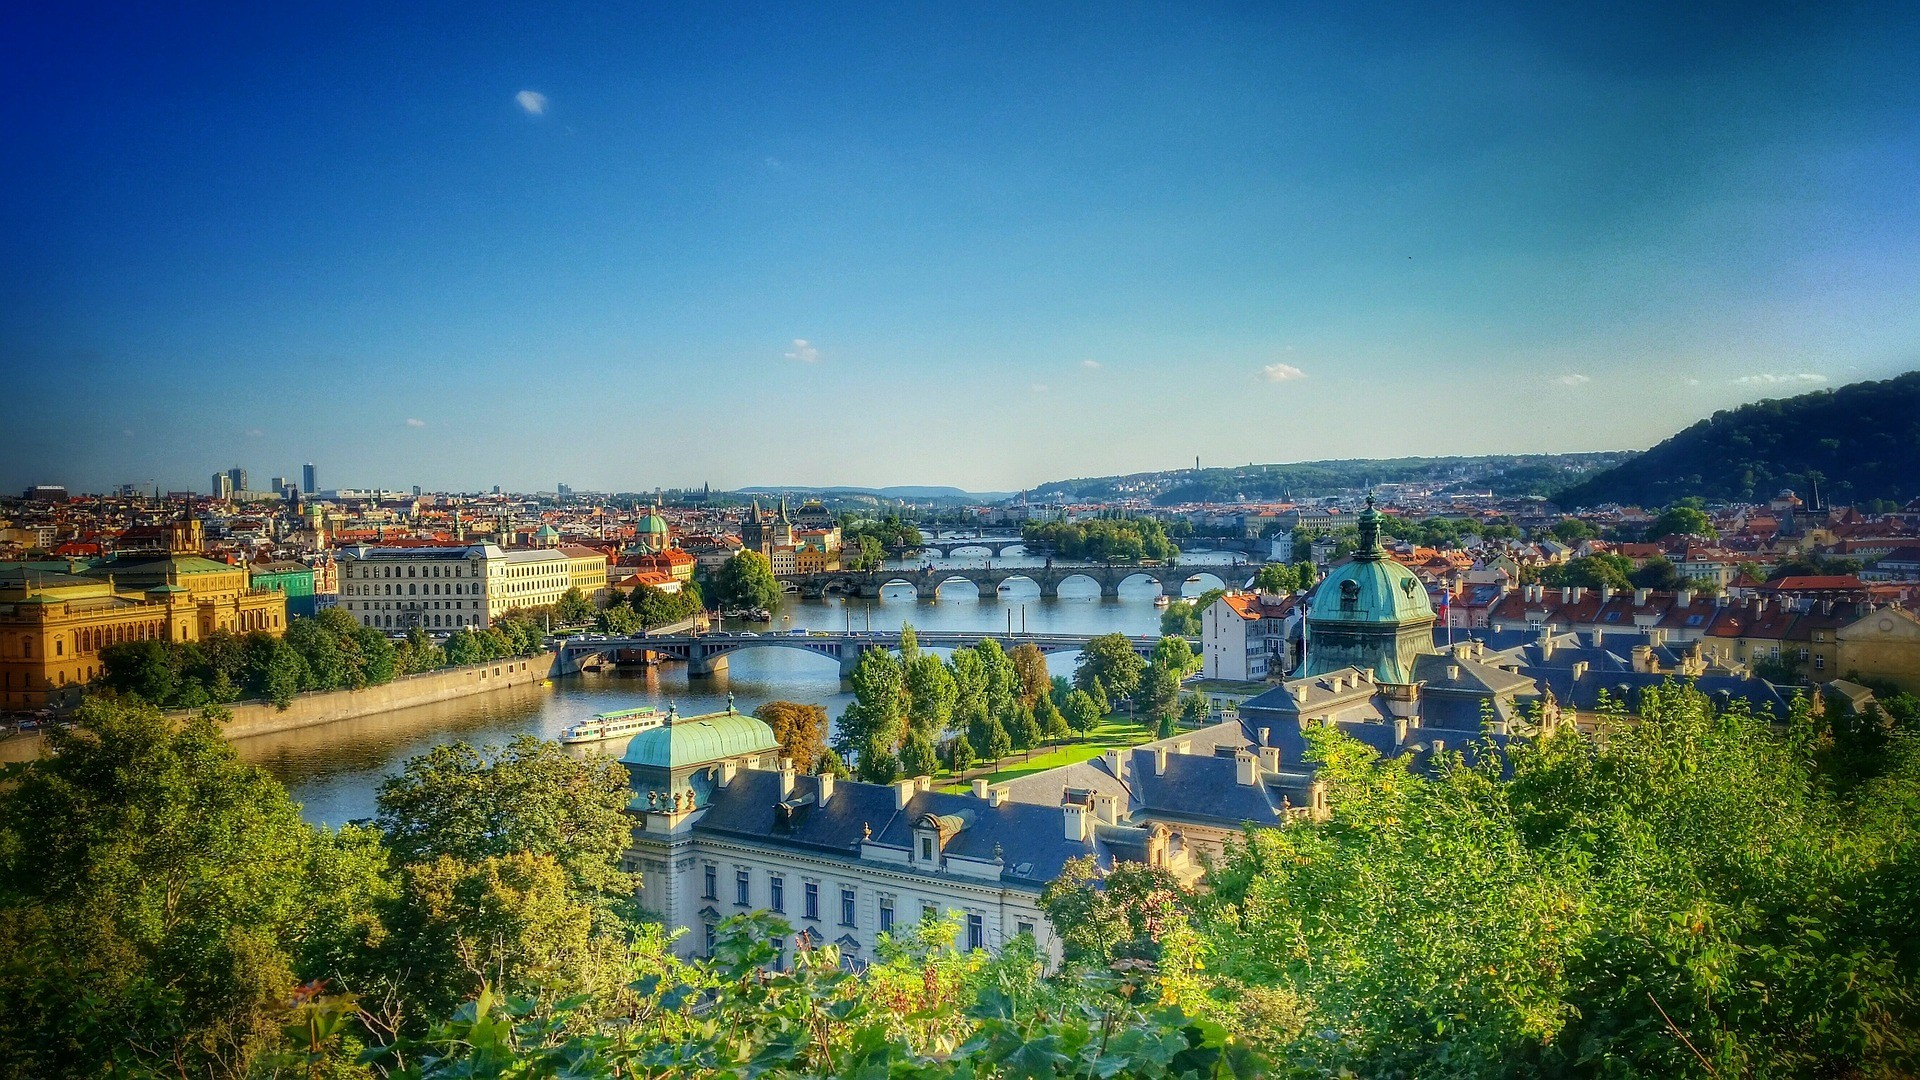 Experiencia en Praga, República Checa, por Karolina